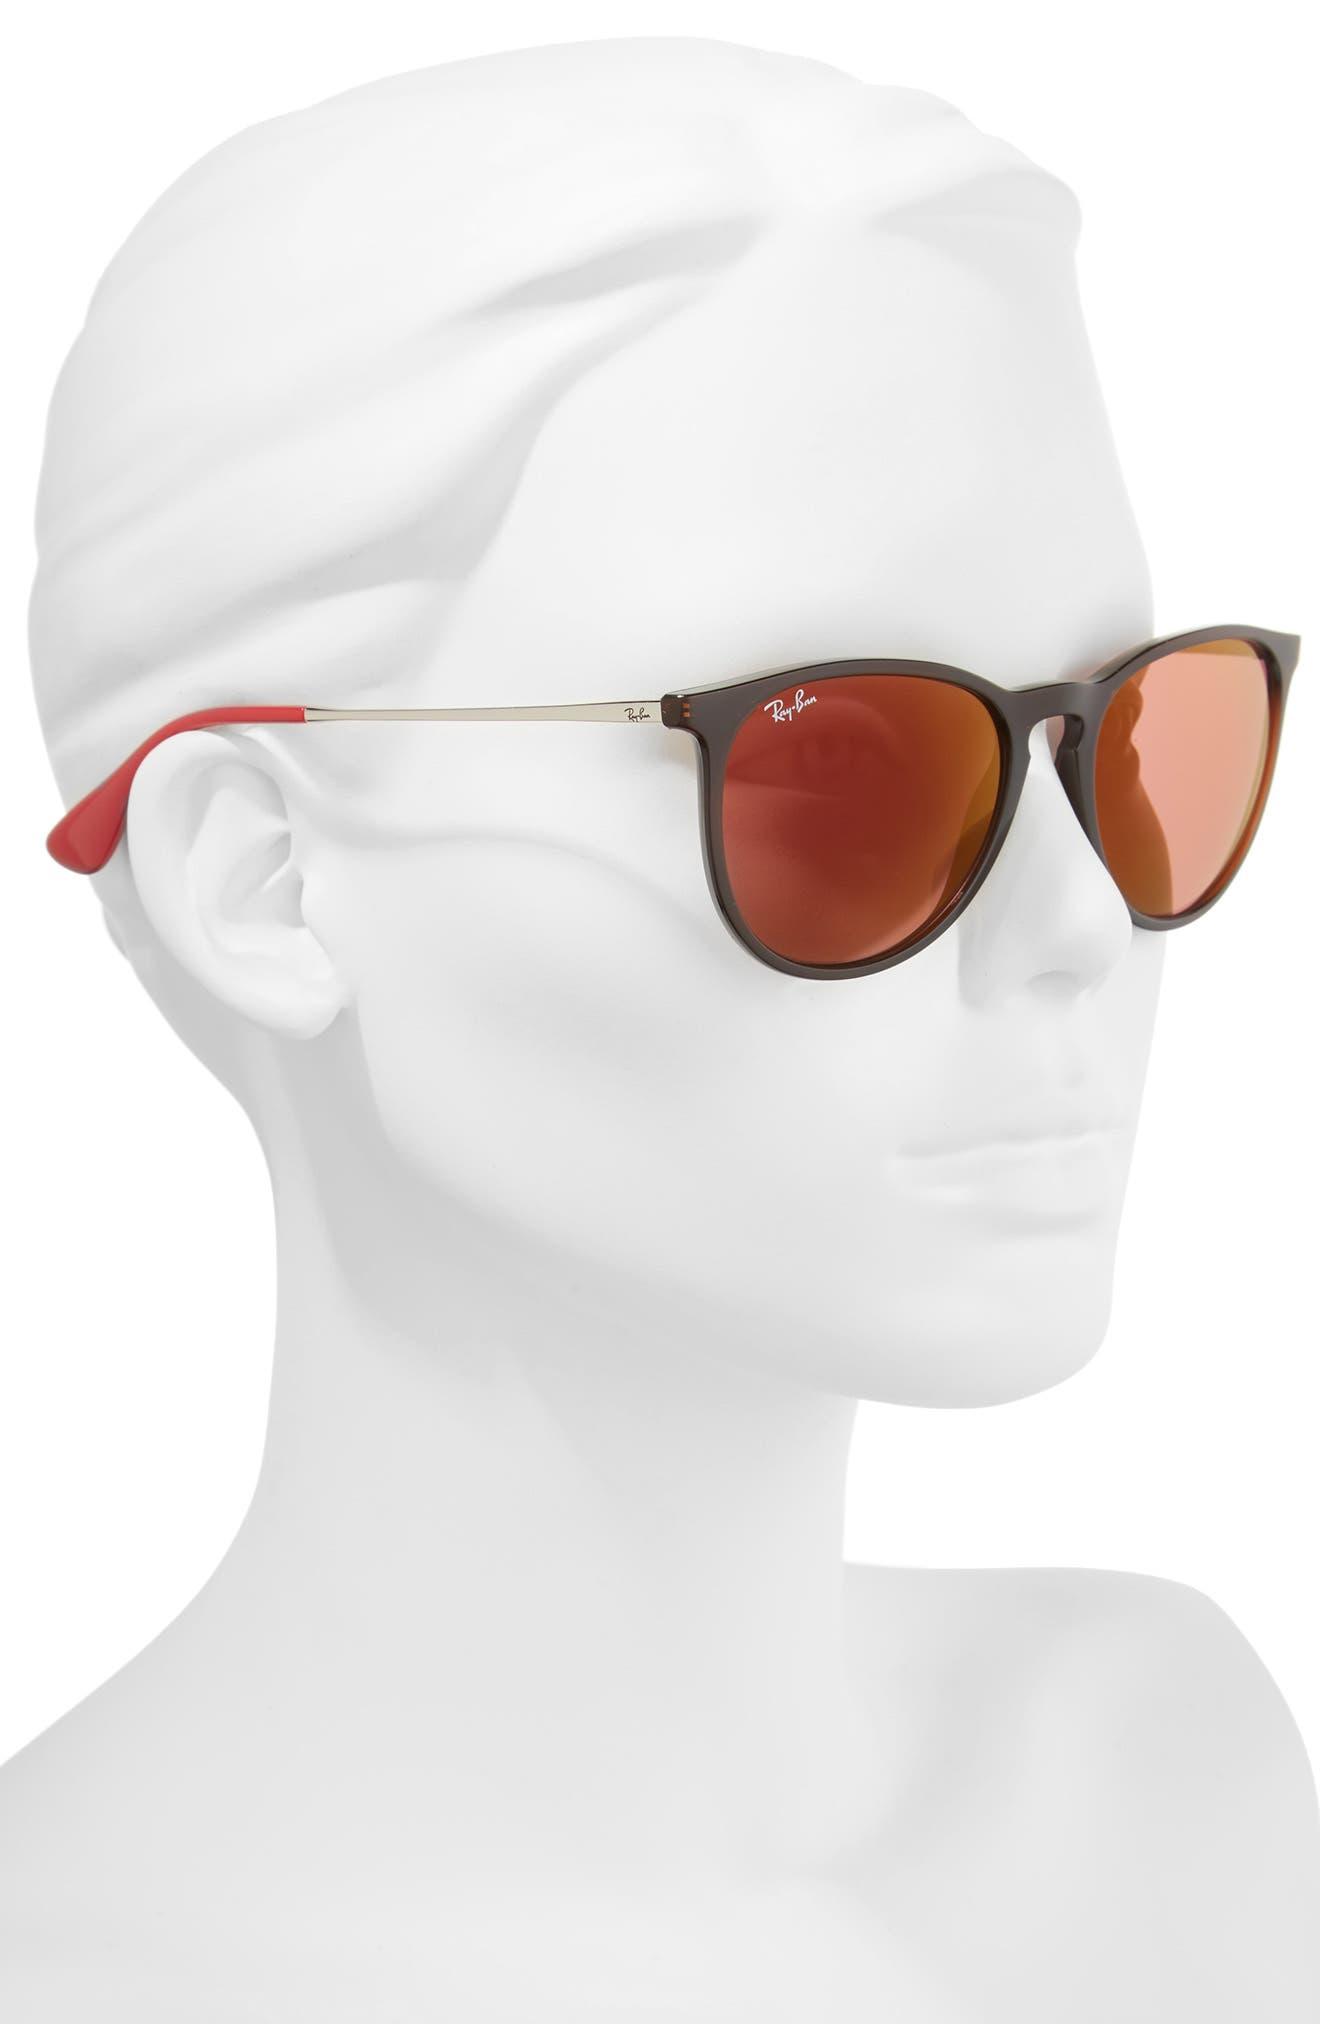 Erika Classic 54mm Sunglasses,                             Alternate thumbnail 2, color,                             203